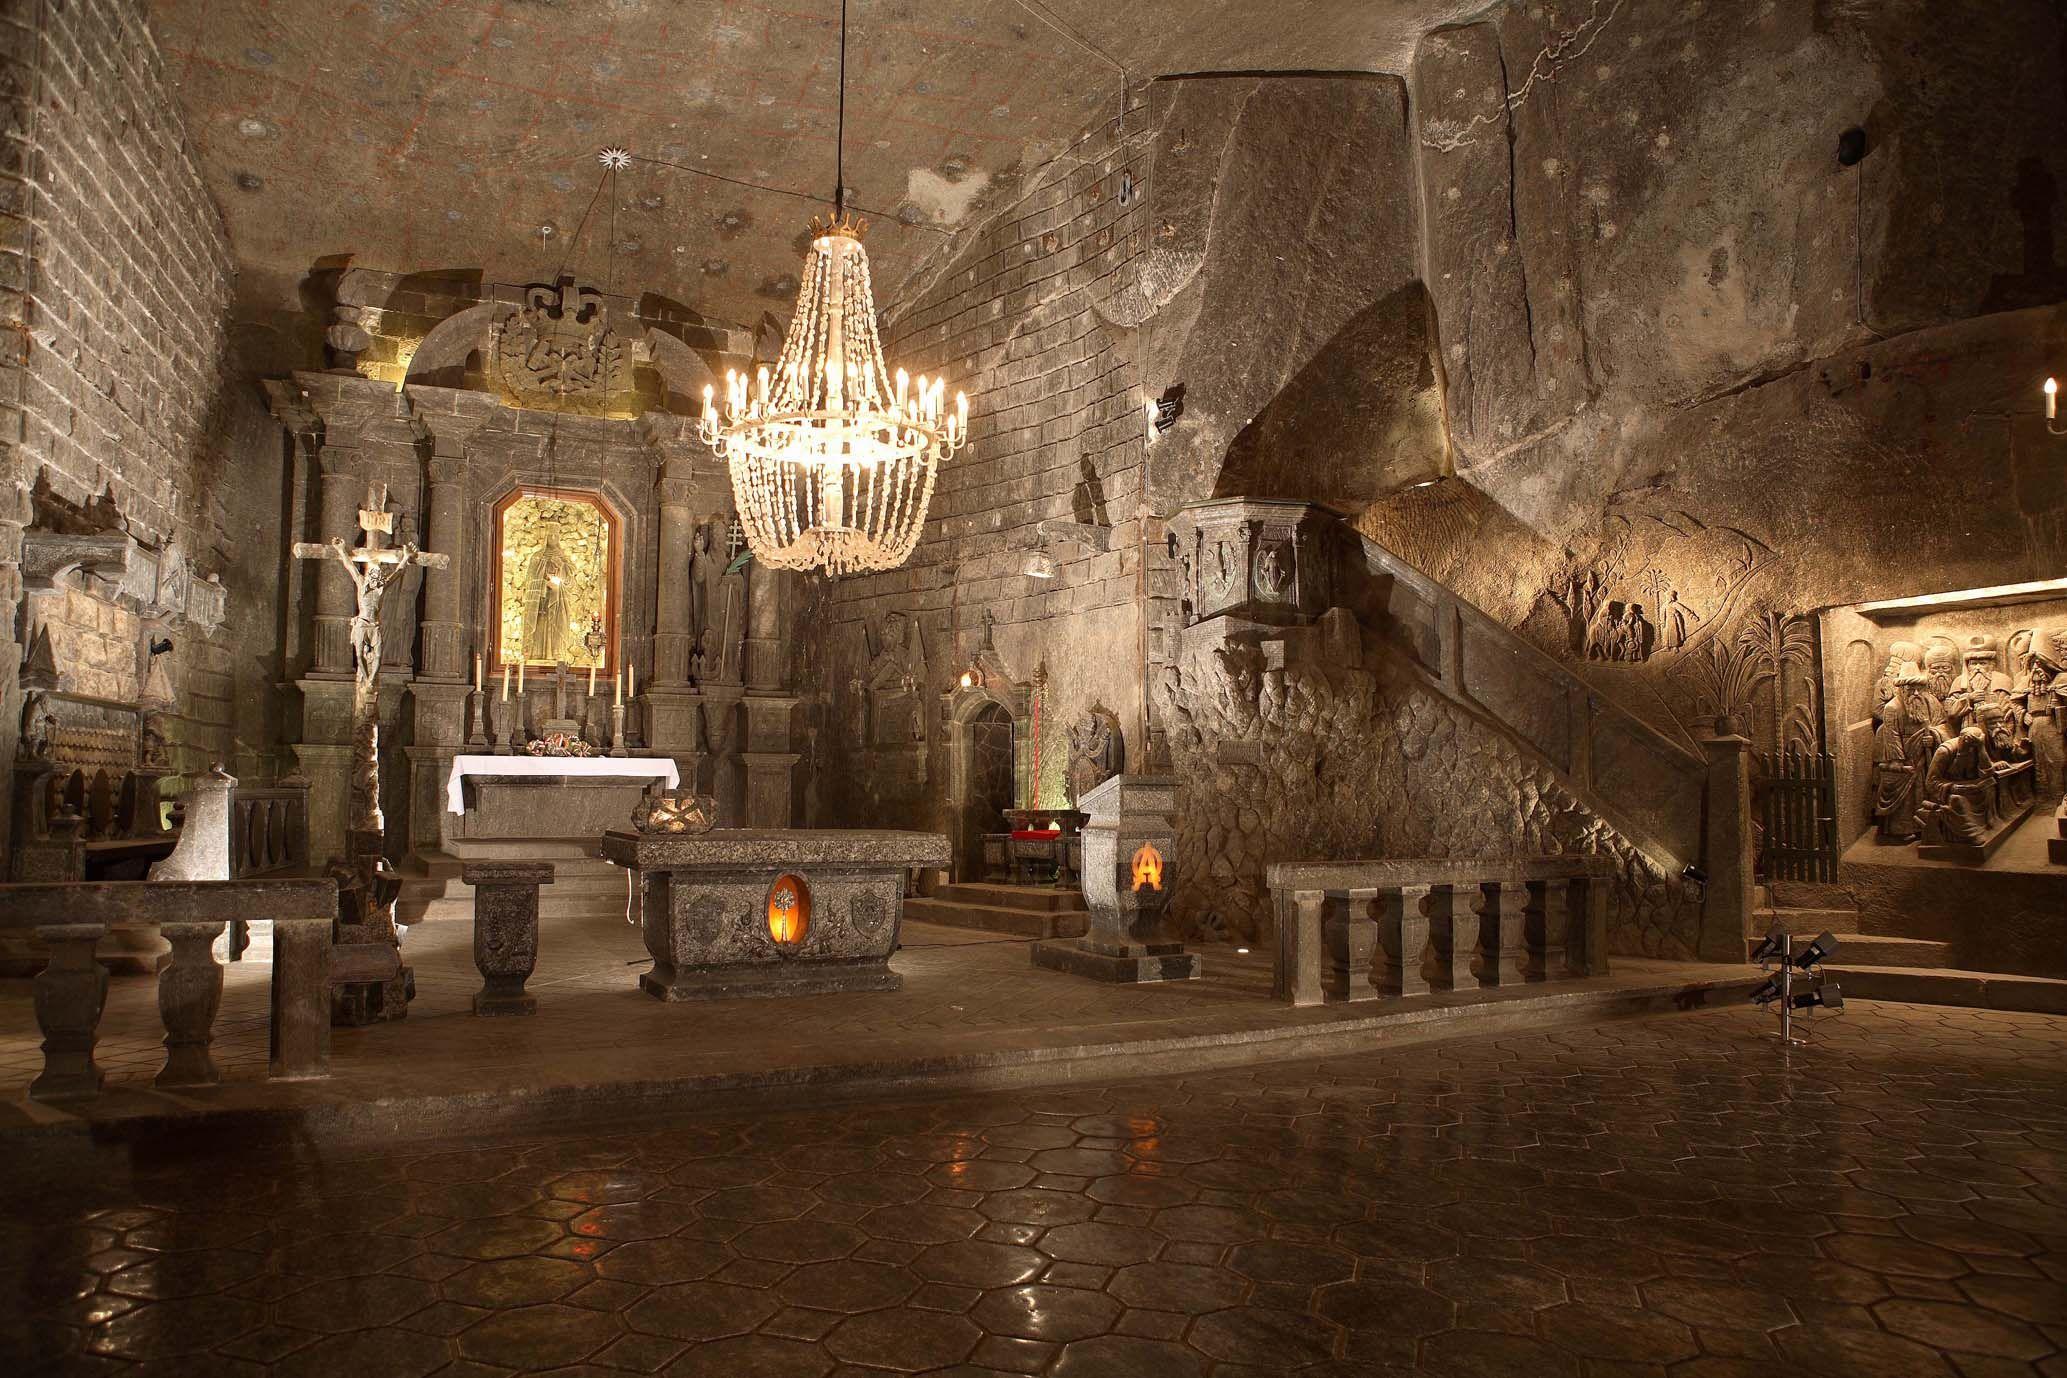 The most popular salt mine in Krakow